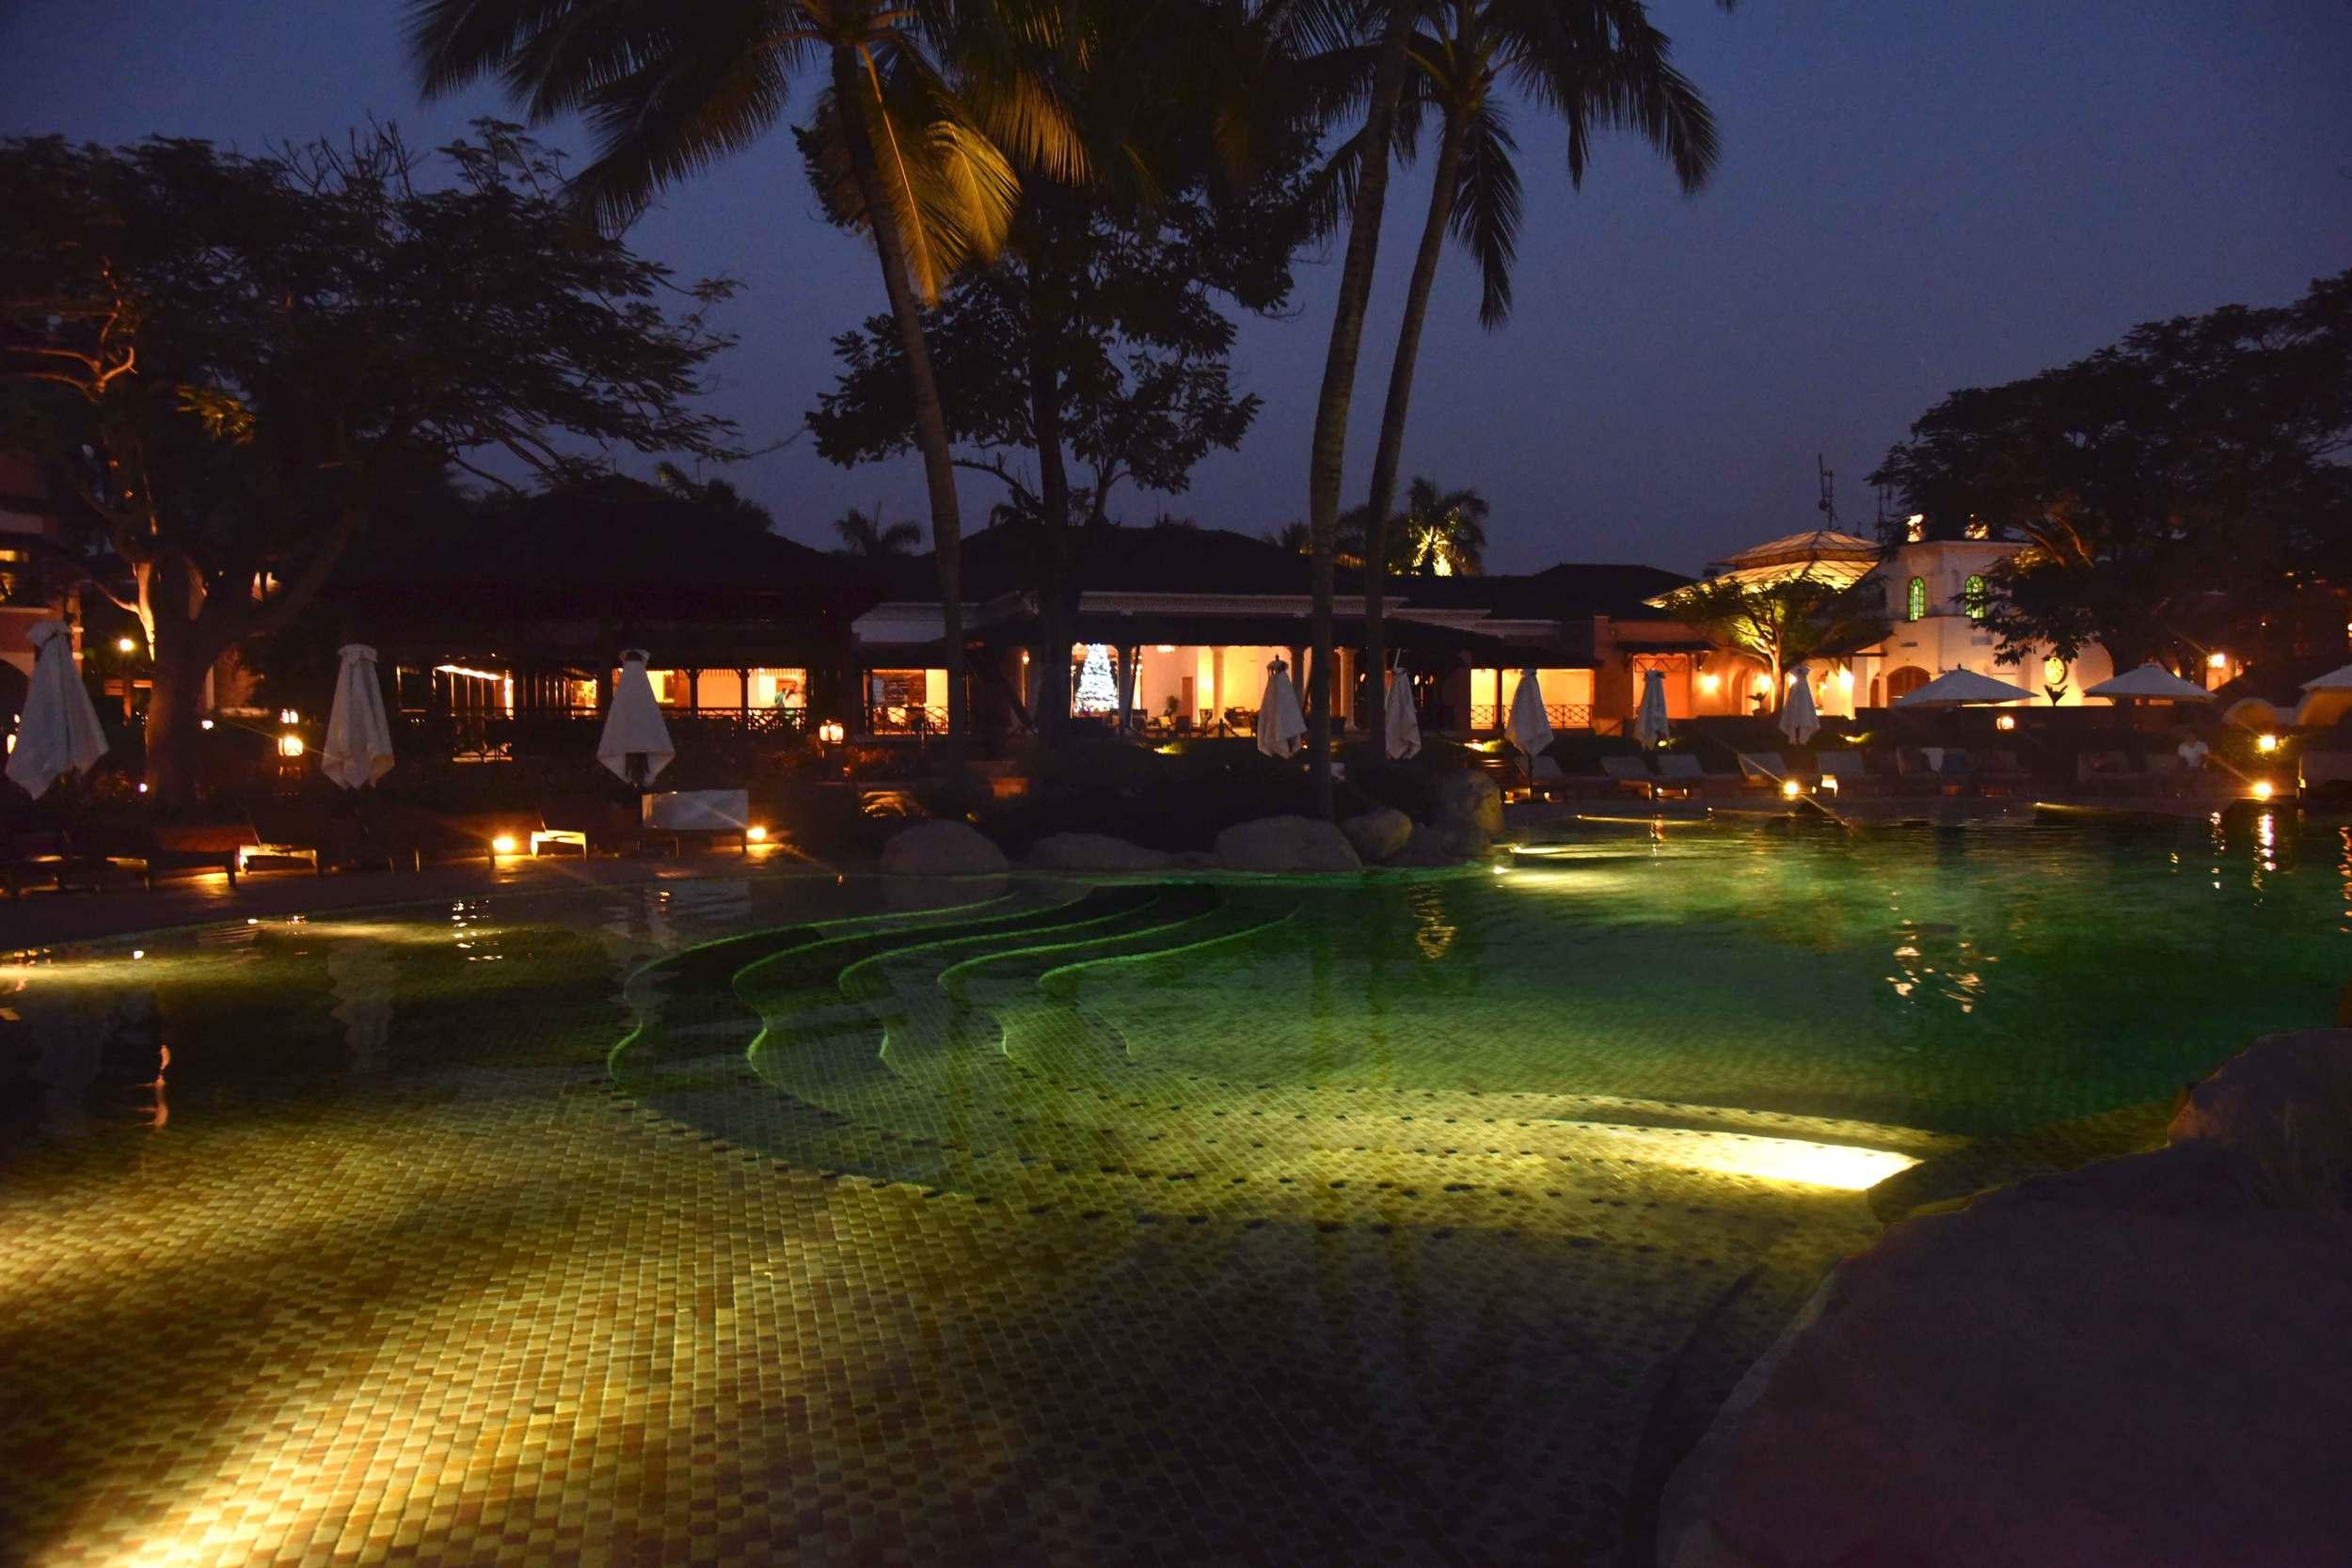 Outdoor pool,Park Hyatt, Goa, India, 5 star hotel, luxury beach resort, spa. Image©thingstodot.com